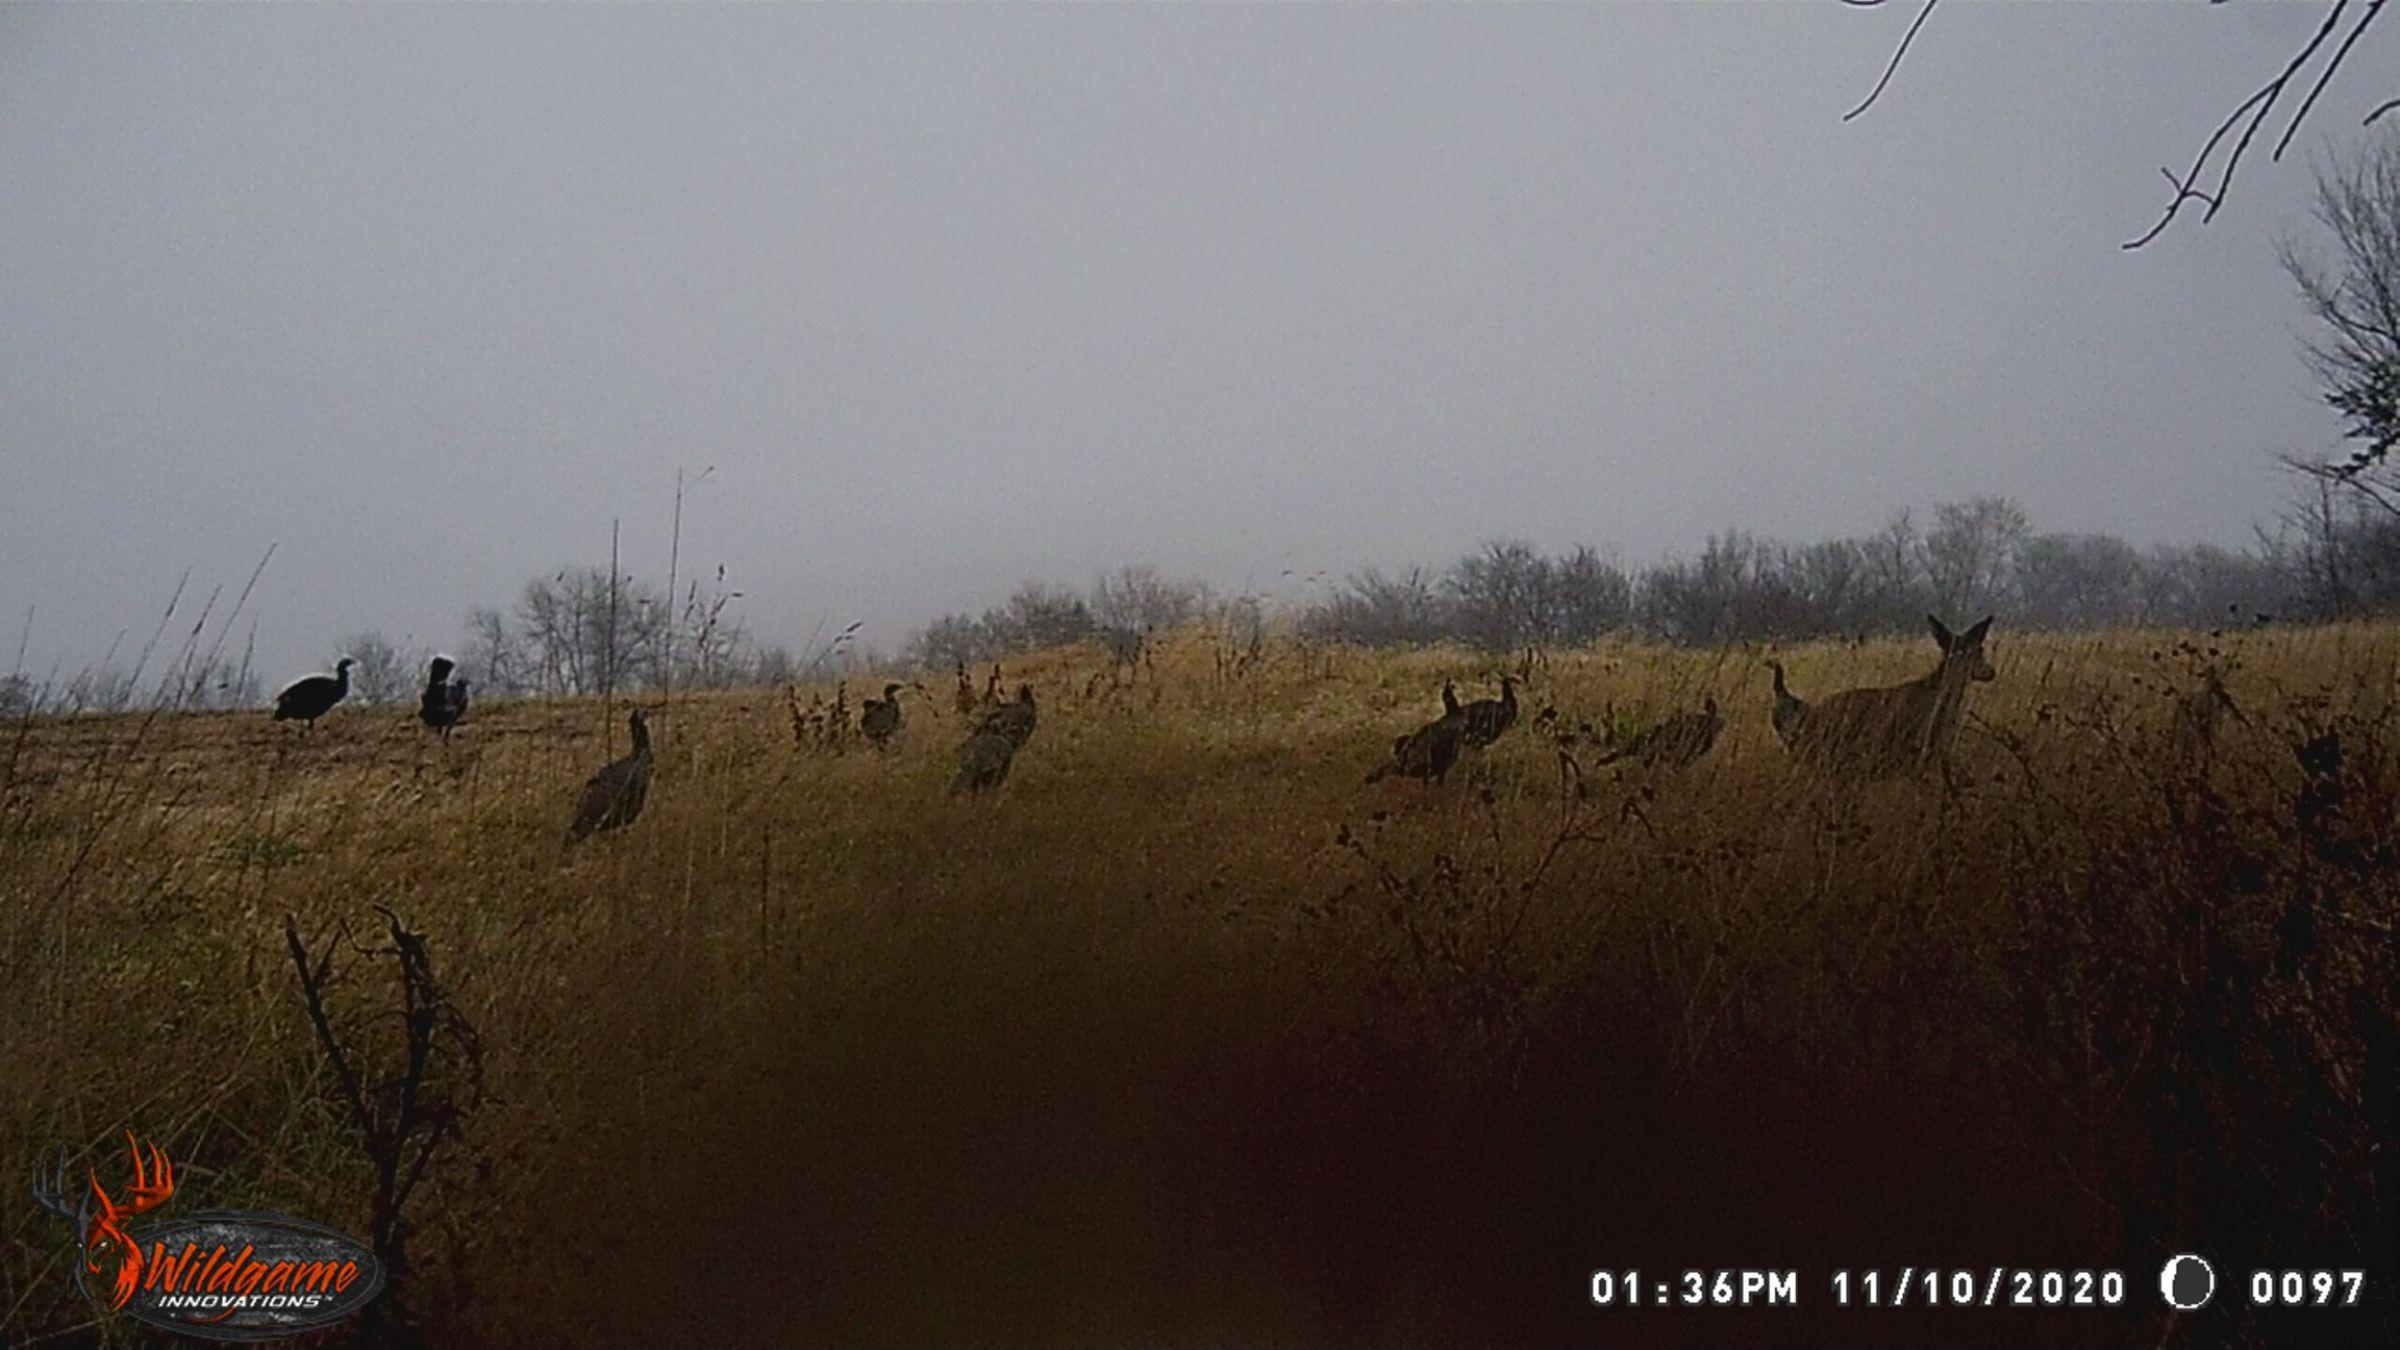 land-warren-county-iowa-68-acres-listing-number-15255-6-2020-11-17-170816.jpg